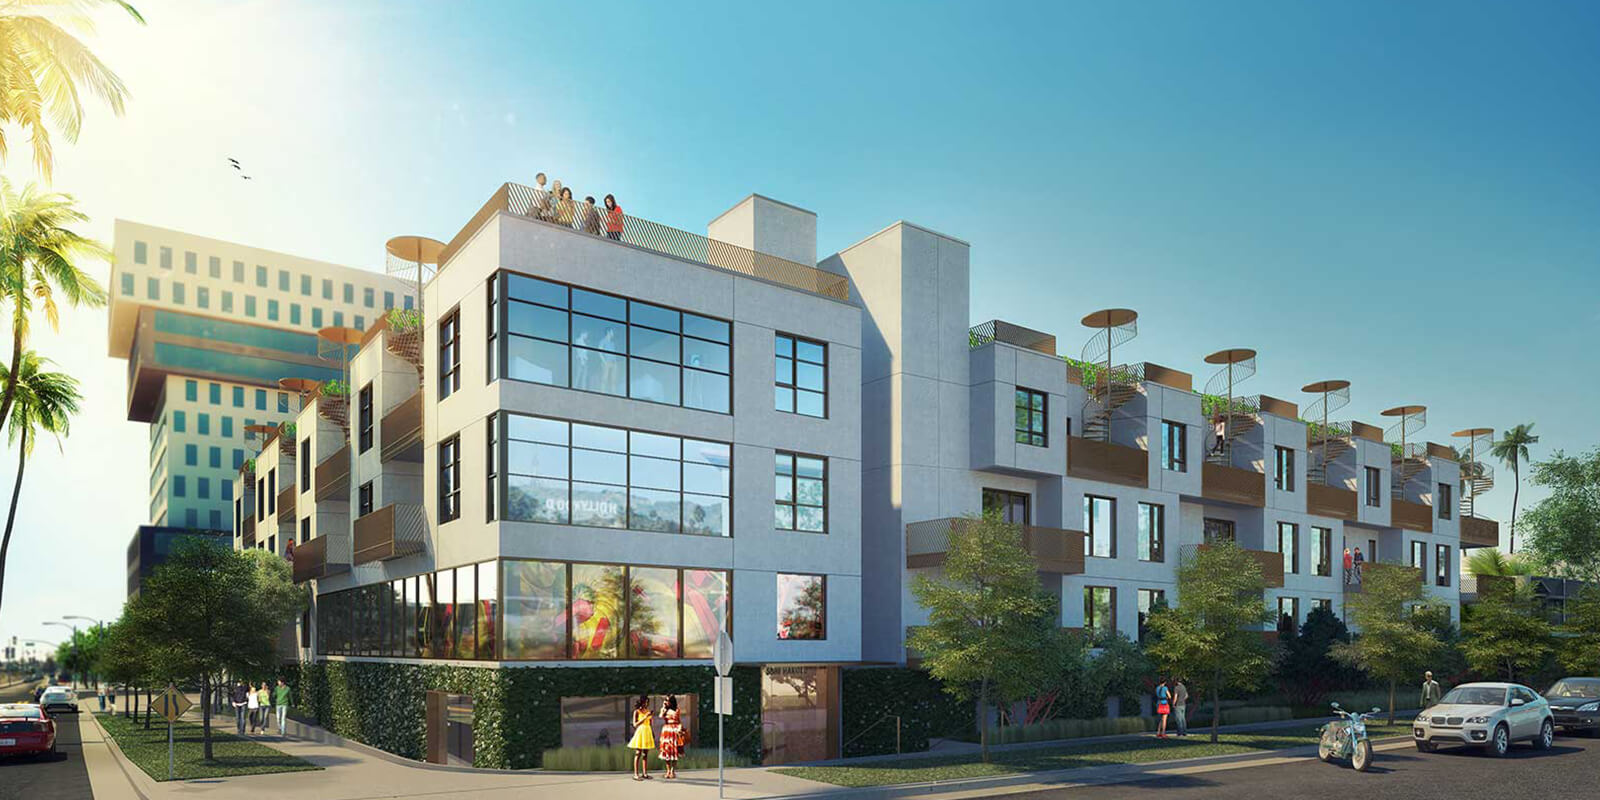 Tanner & White Properties, Inc